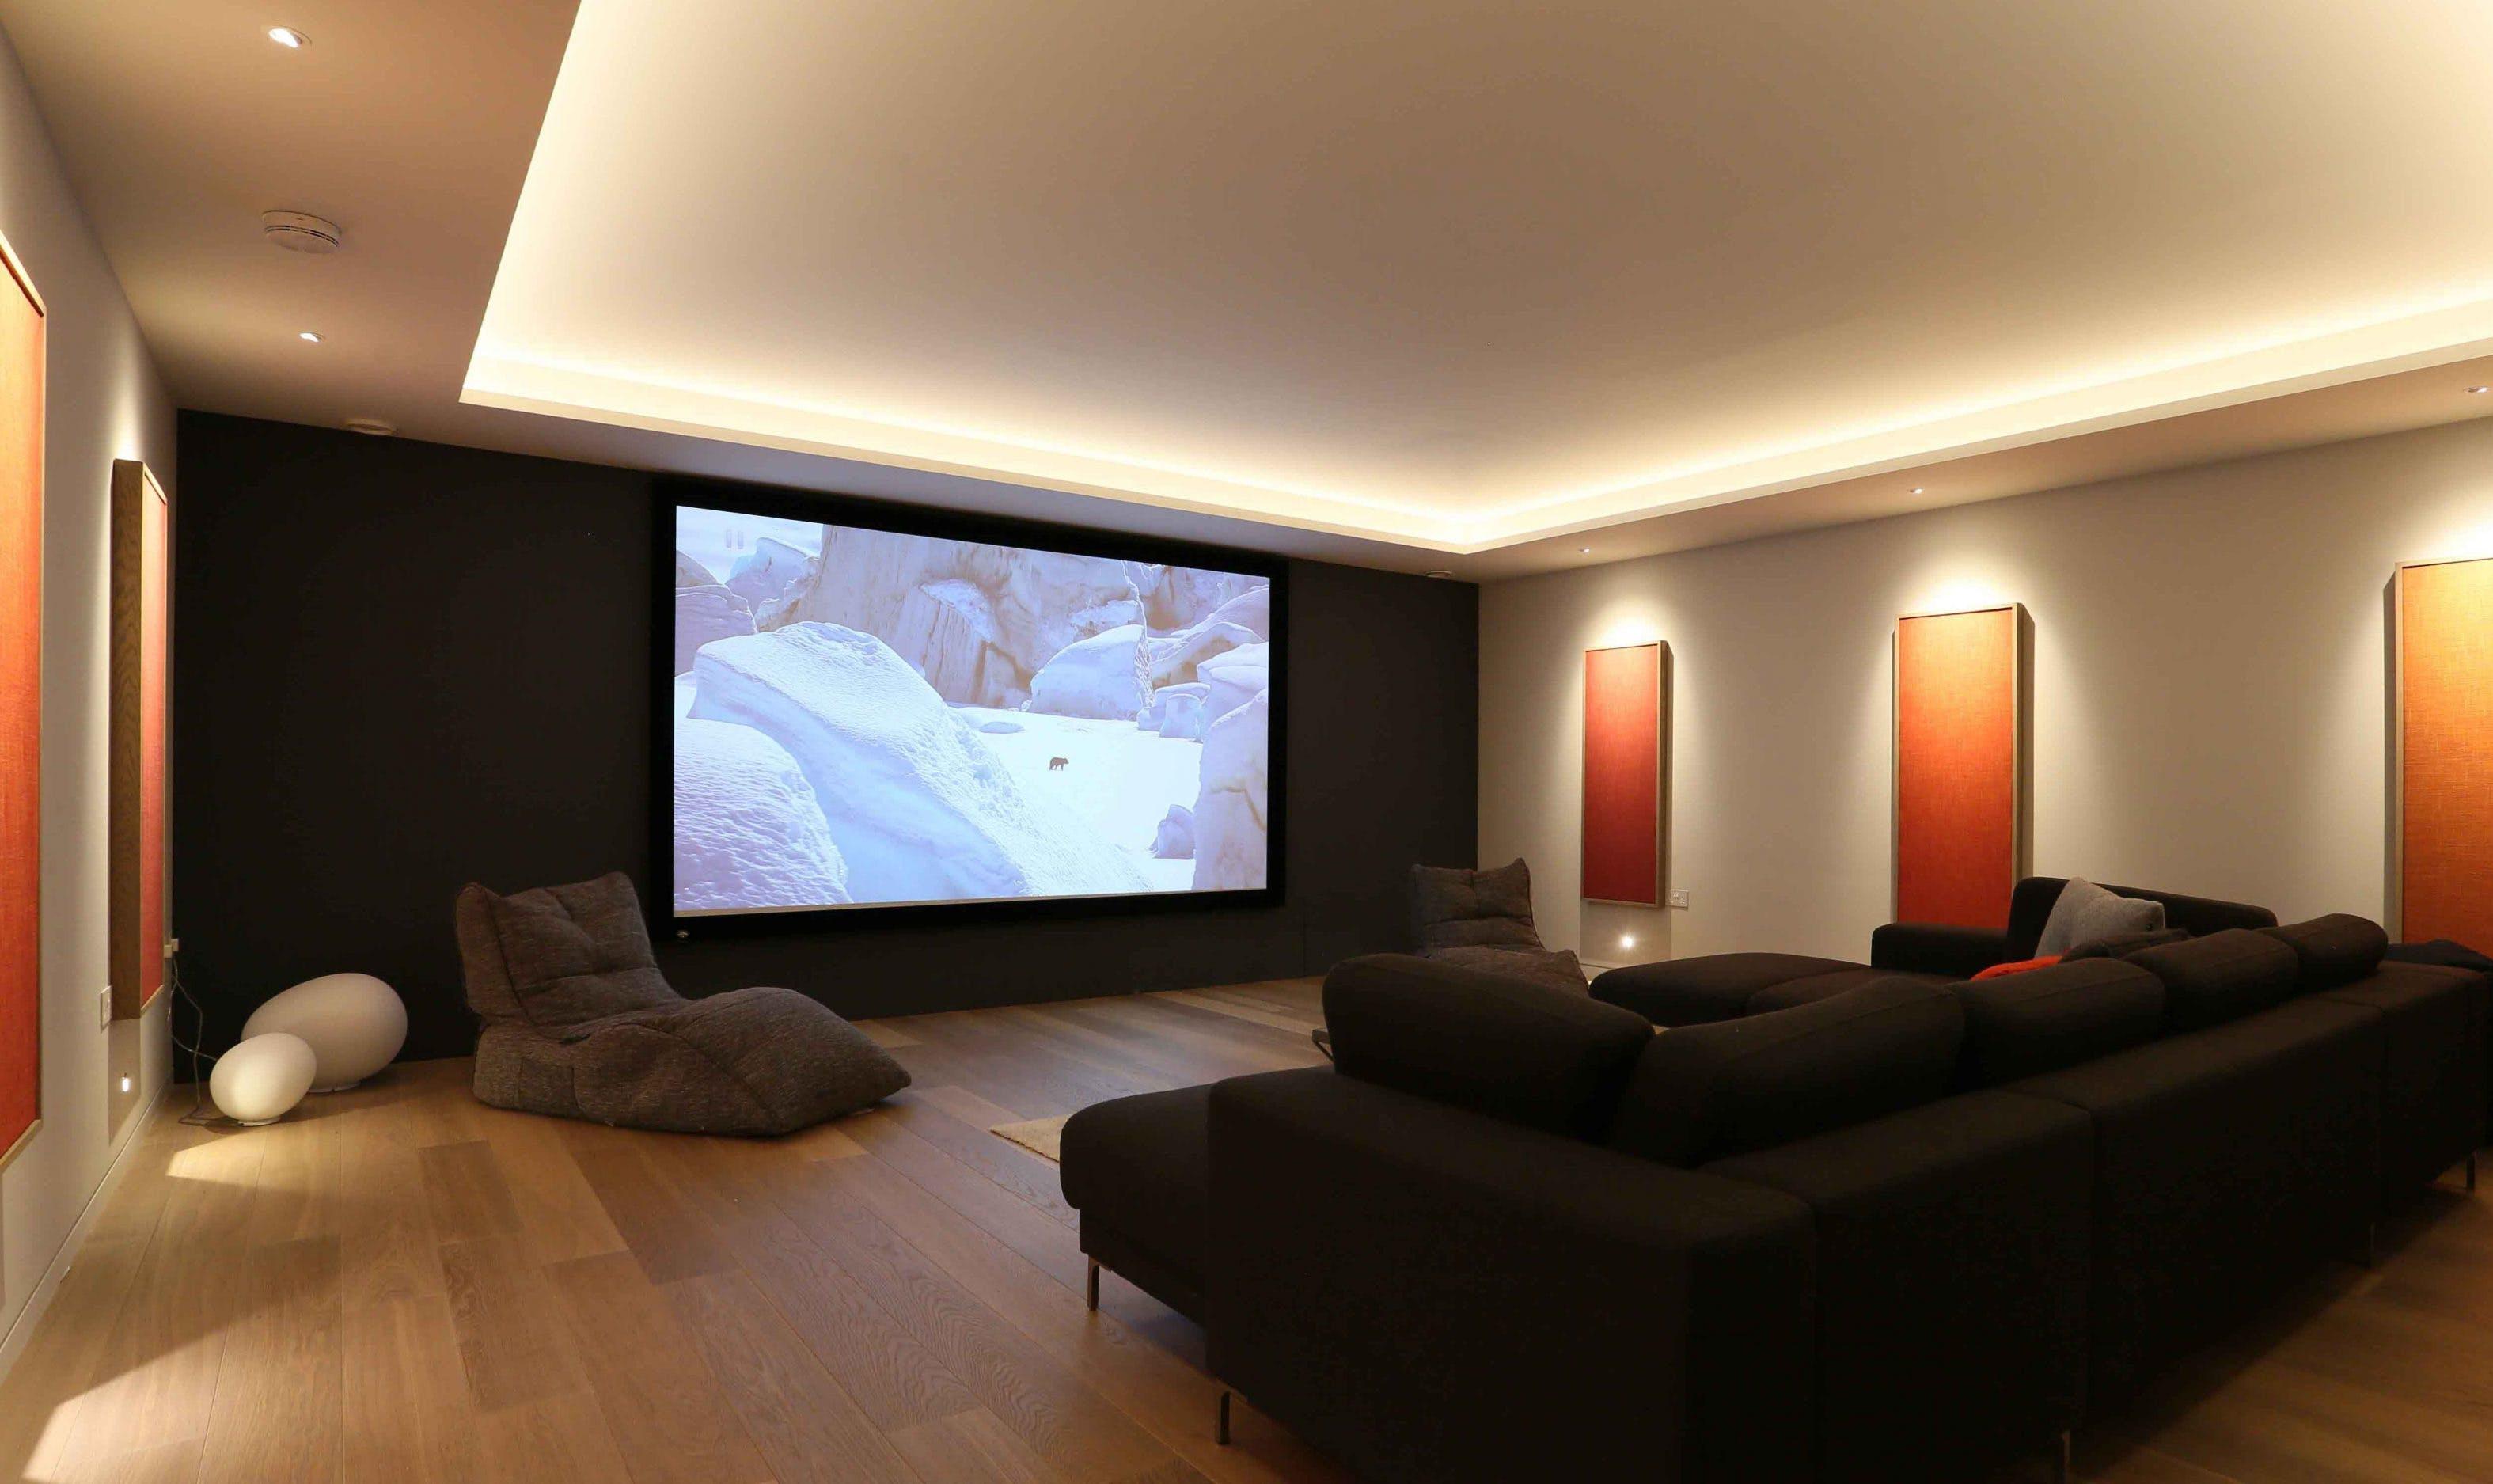 basement cinema room lighting with coffer ceiling